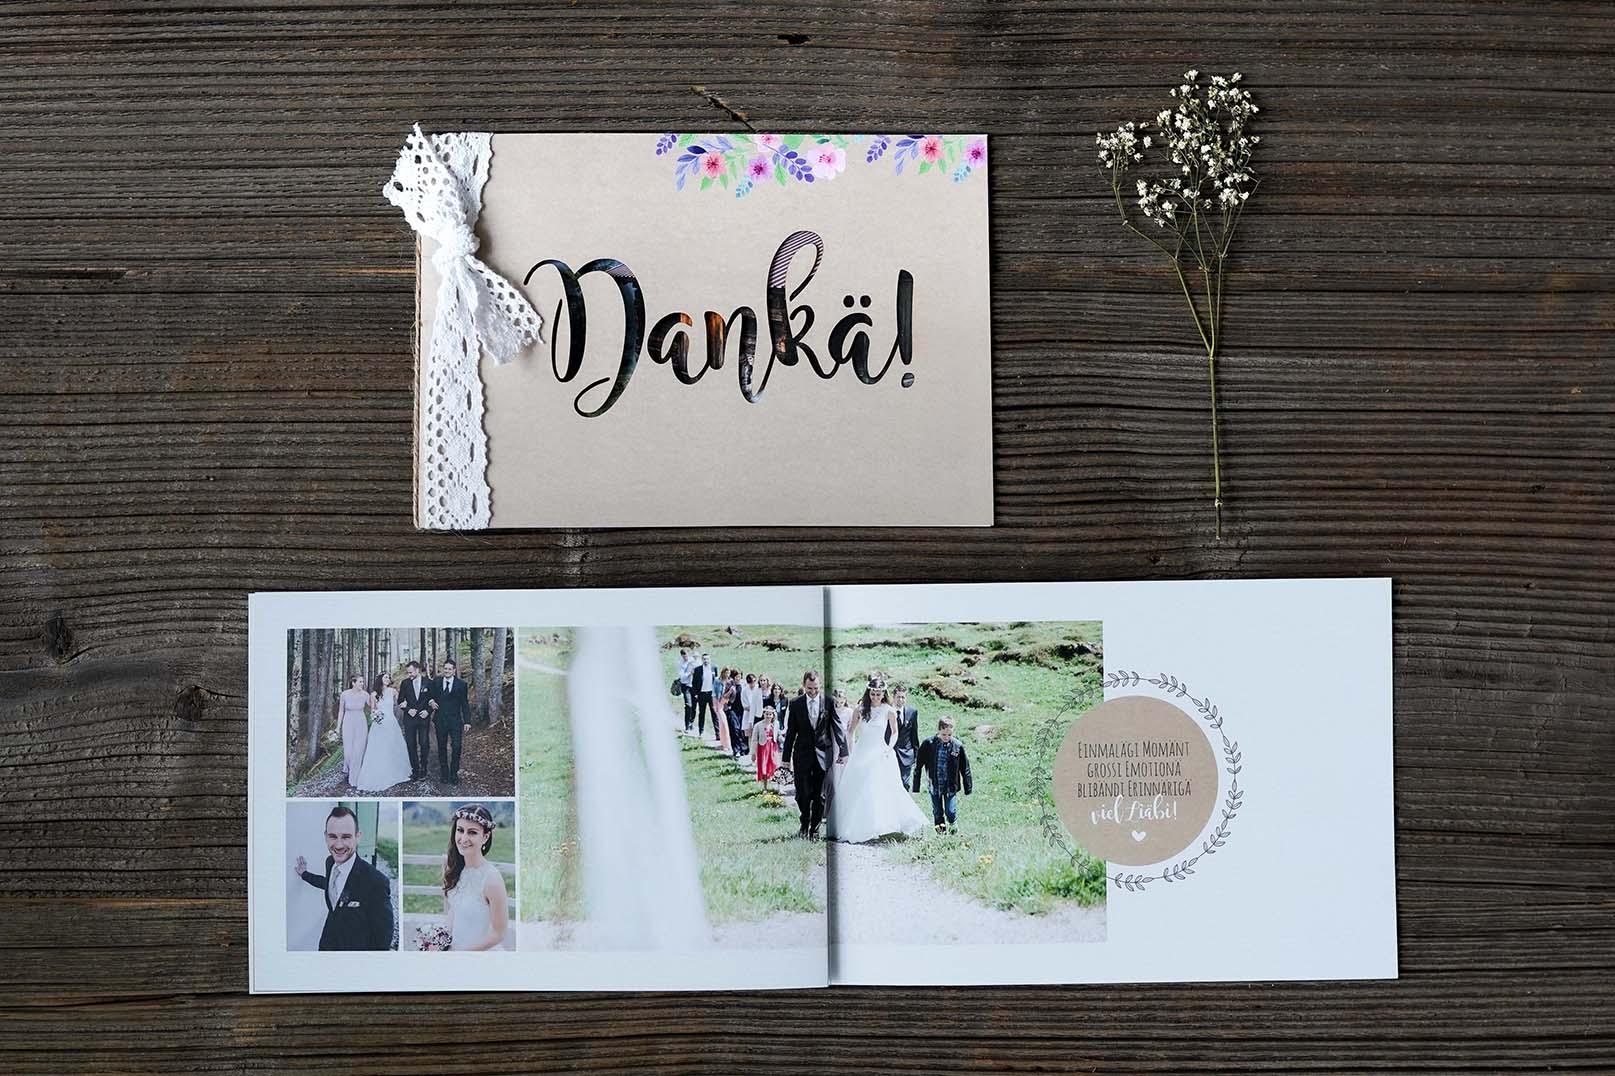 Hochzeitsdankeskarte Ueli & Angela